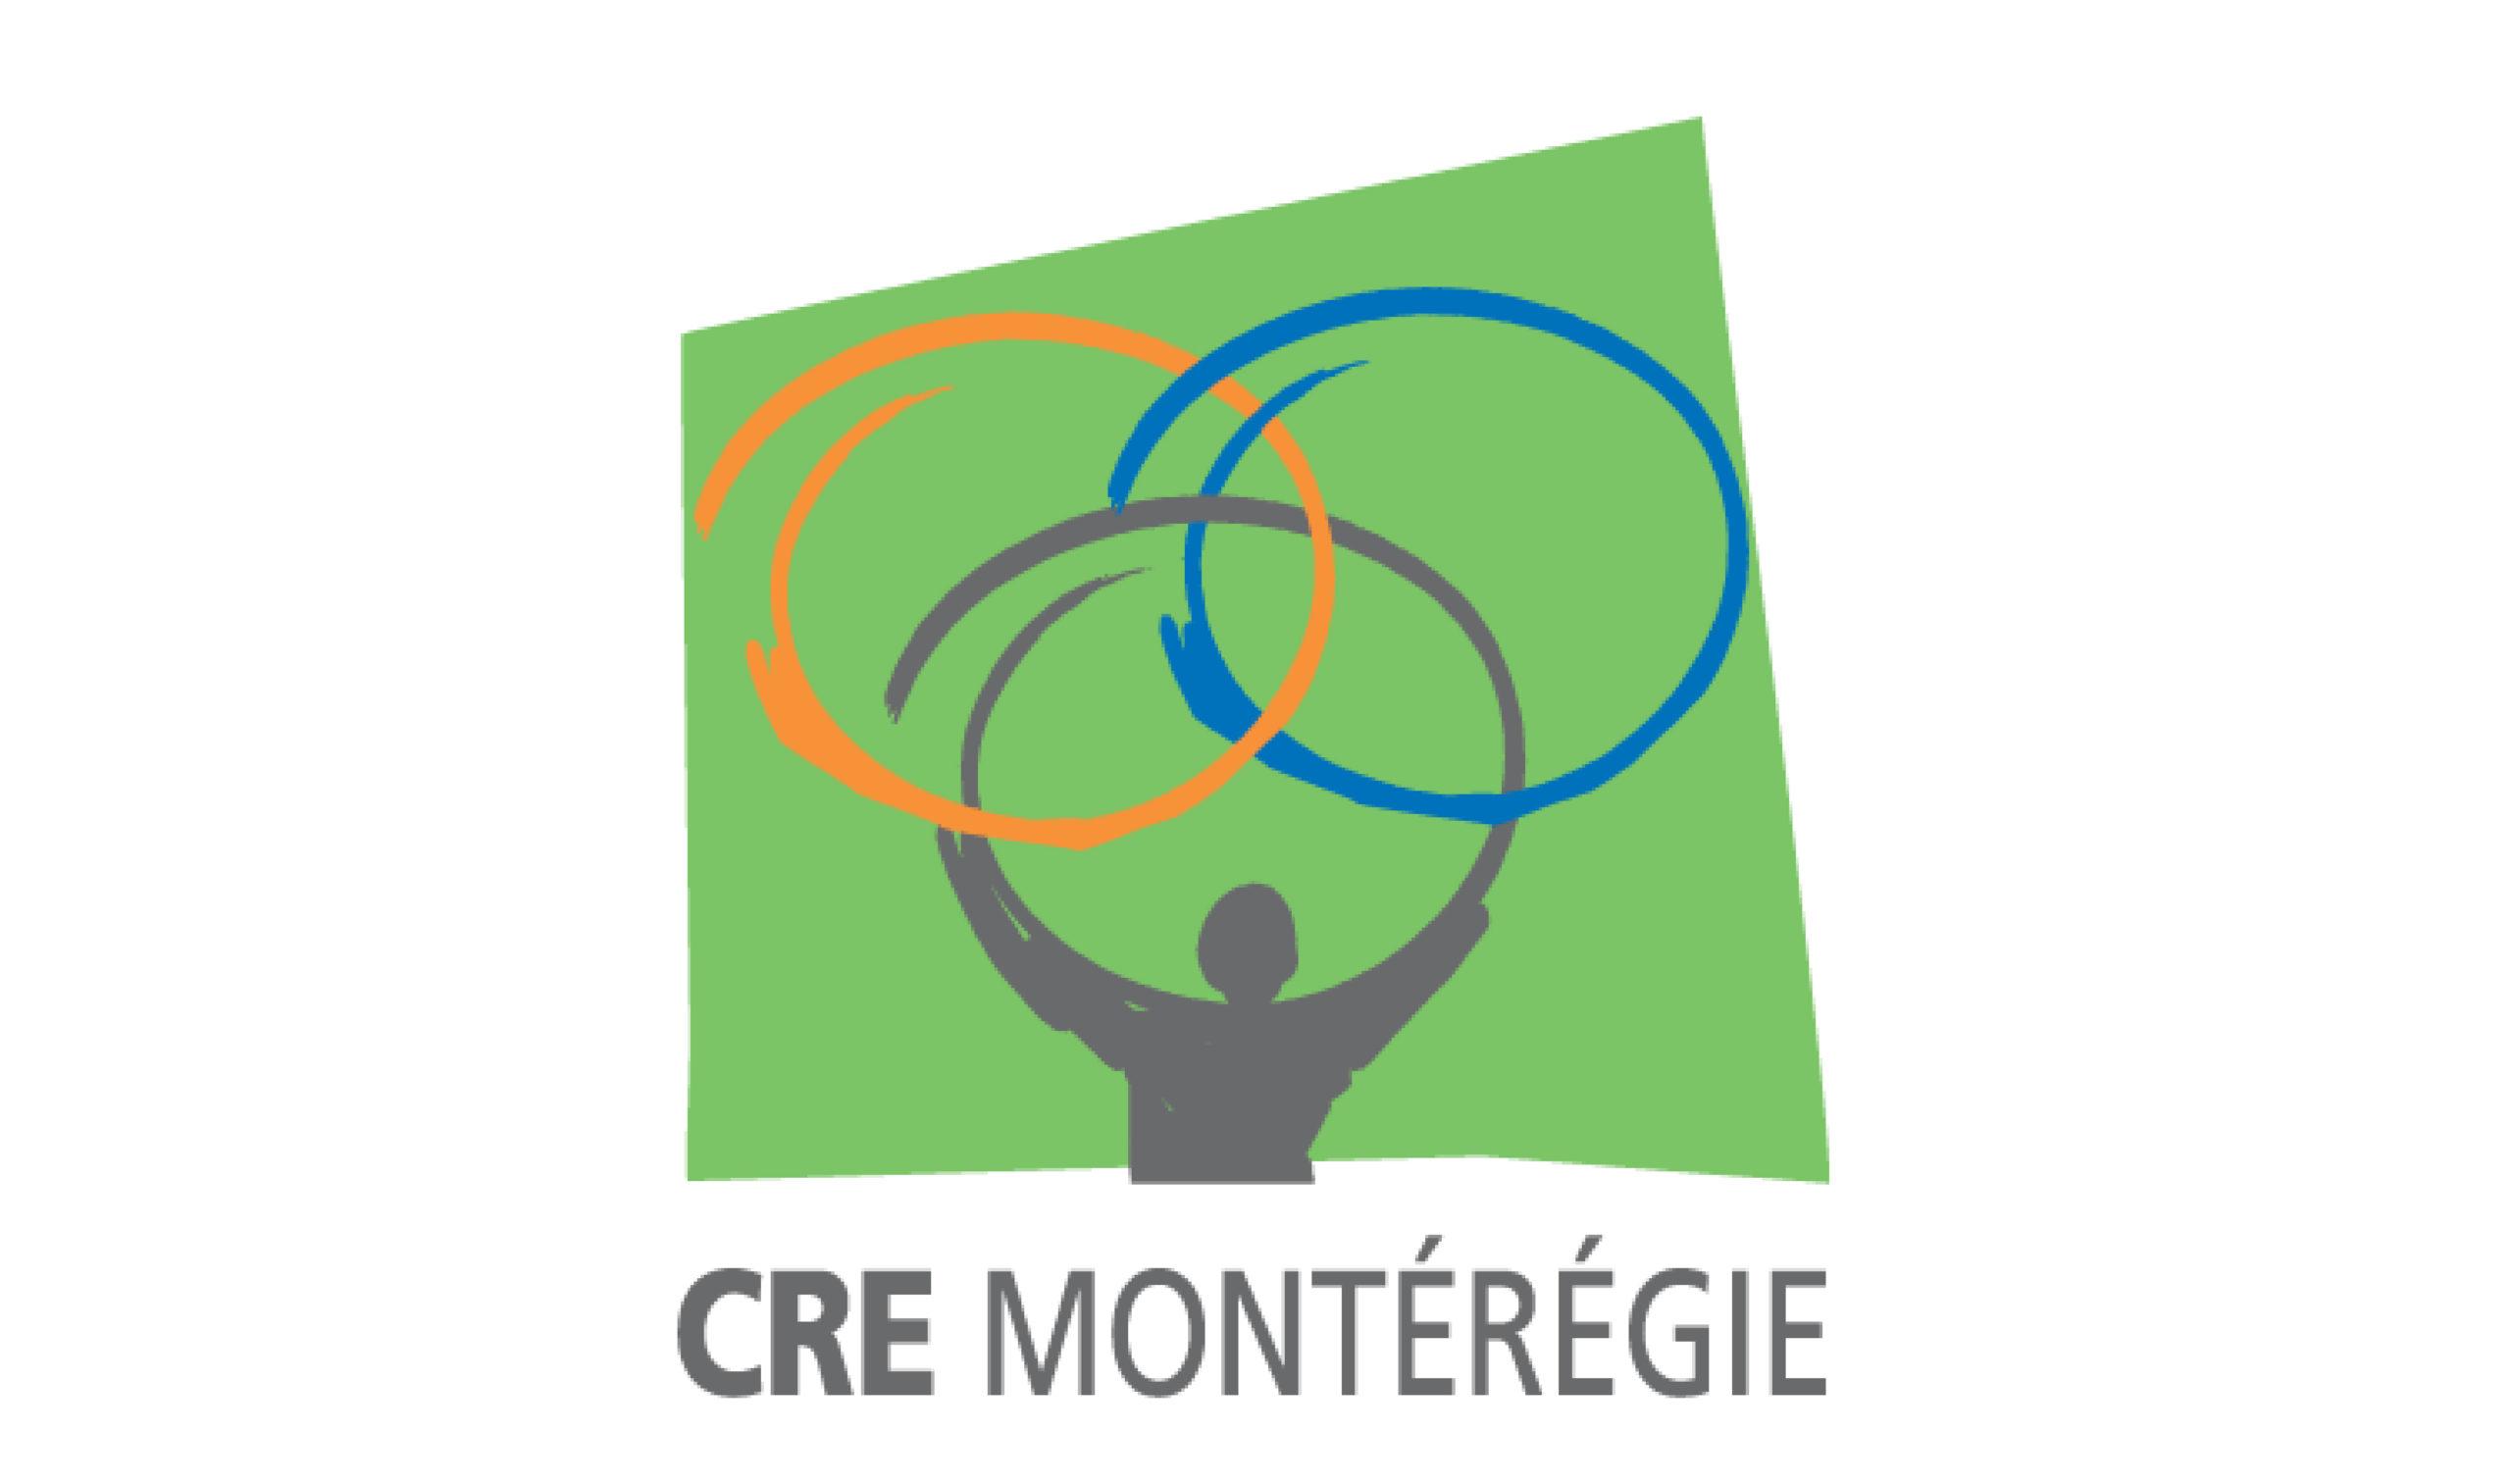 16-Monteregie-crem-conseilregionaldelenvironnement